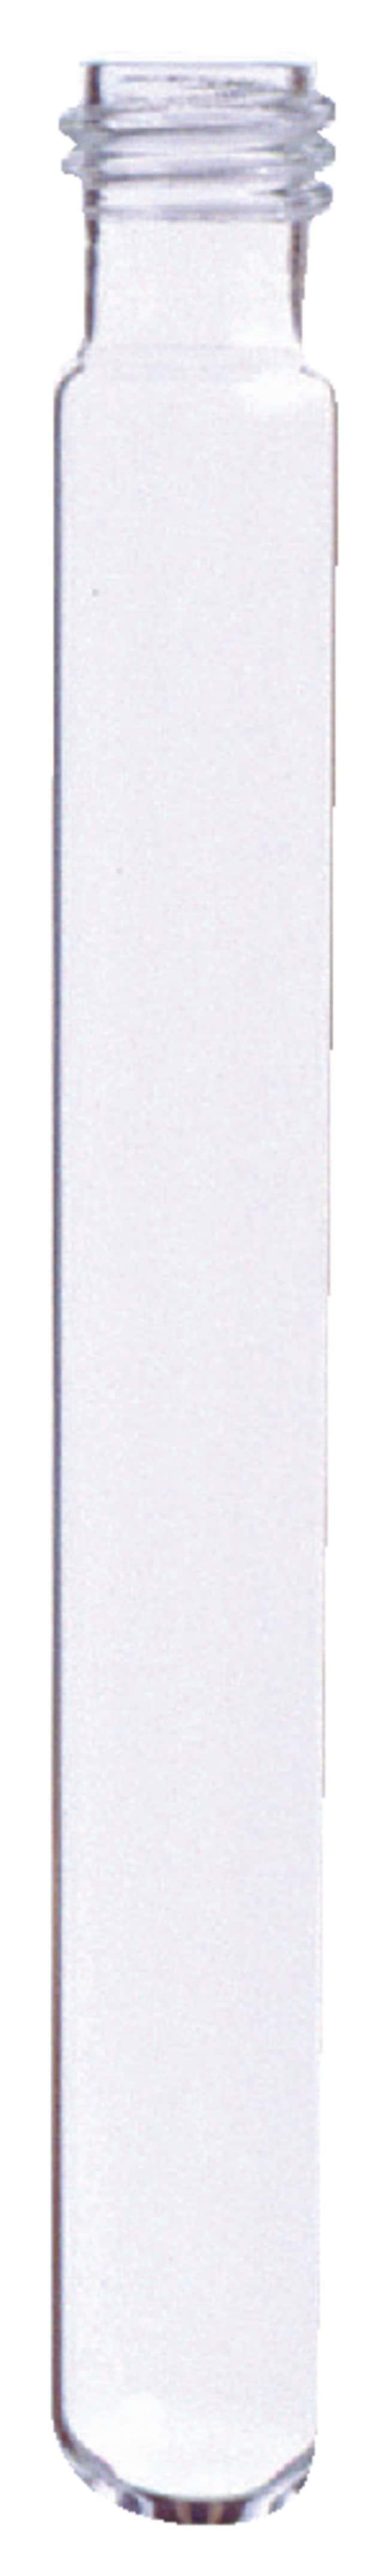 DWK Life SciencesKimble Disposable Borosilicate Glass Tubes with Threaded